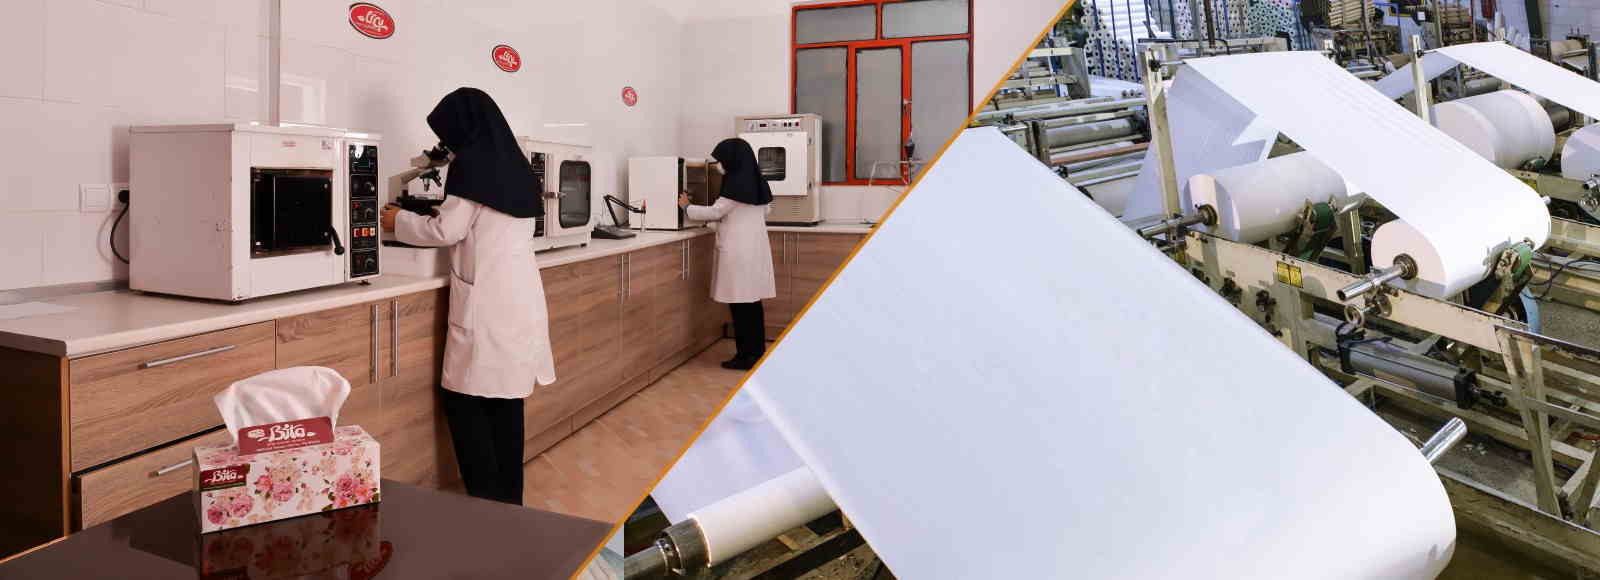 فروش عمده دستمال کاغذی بیتا